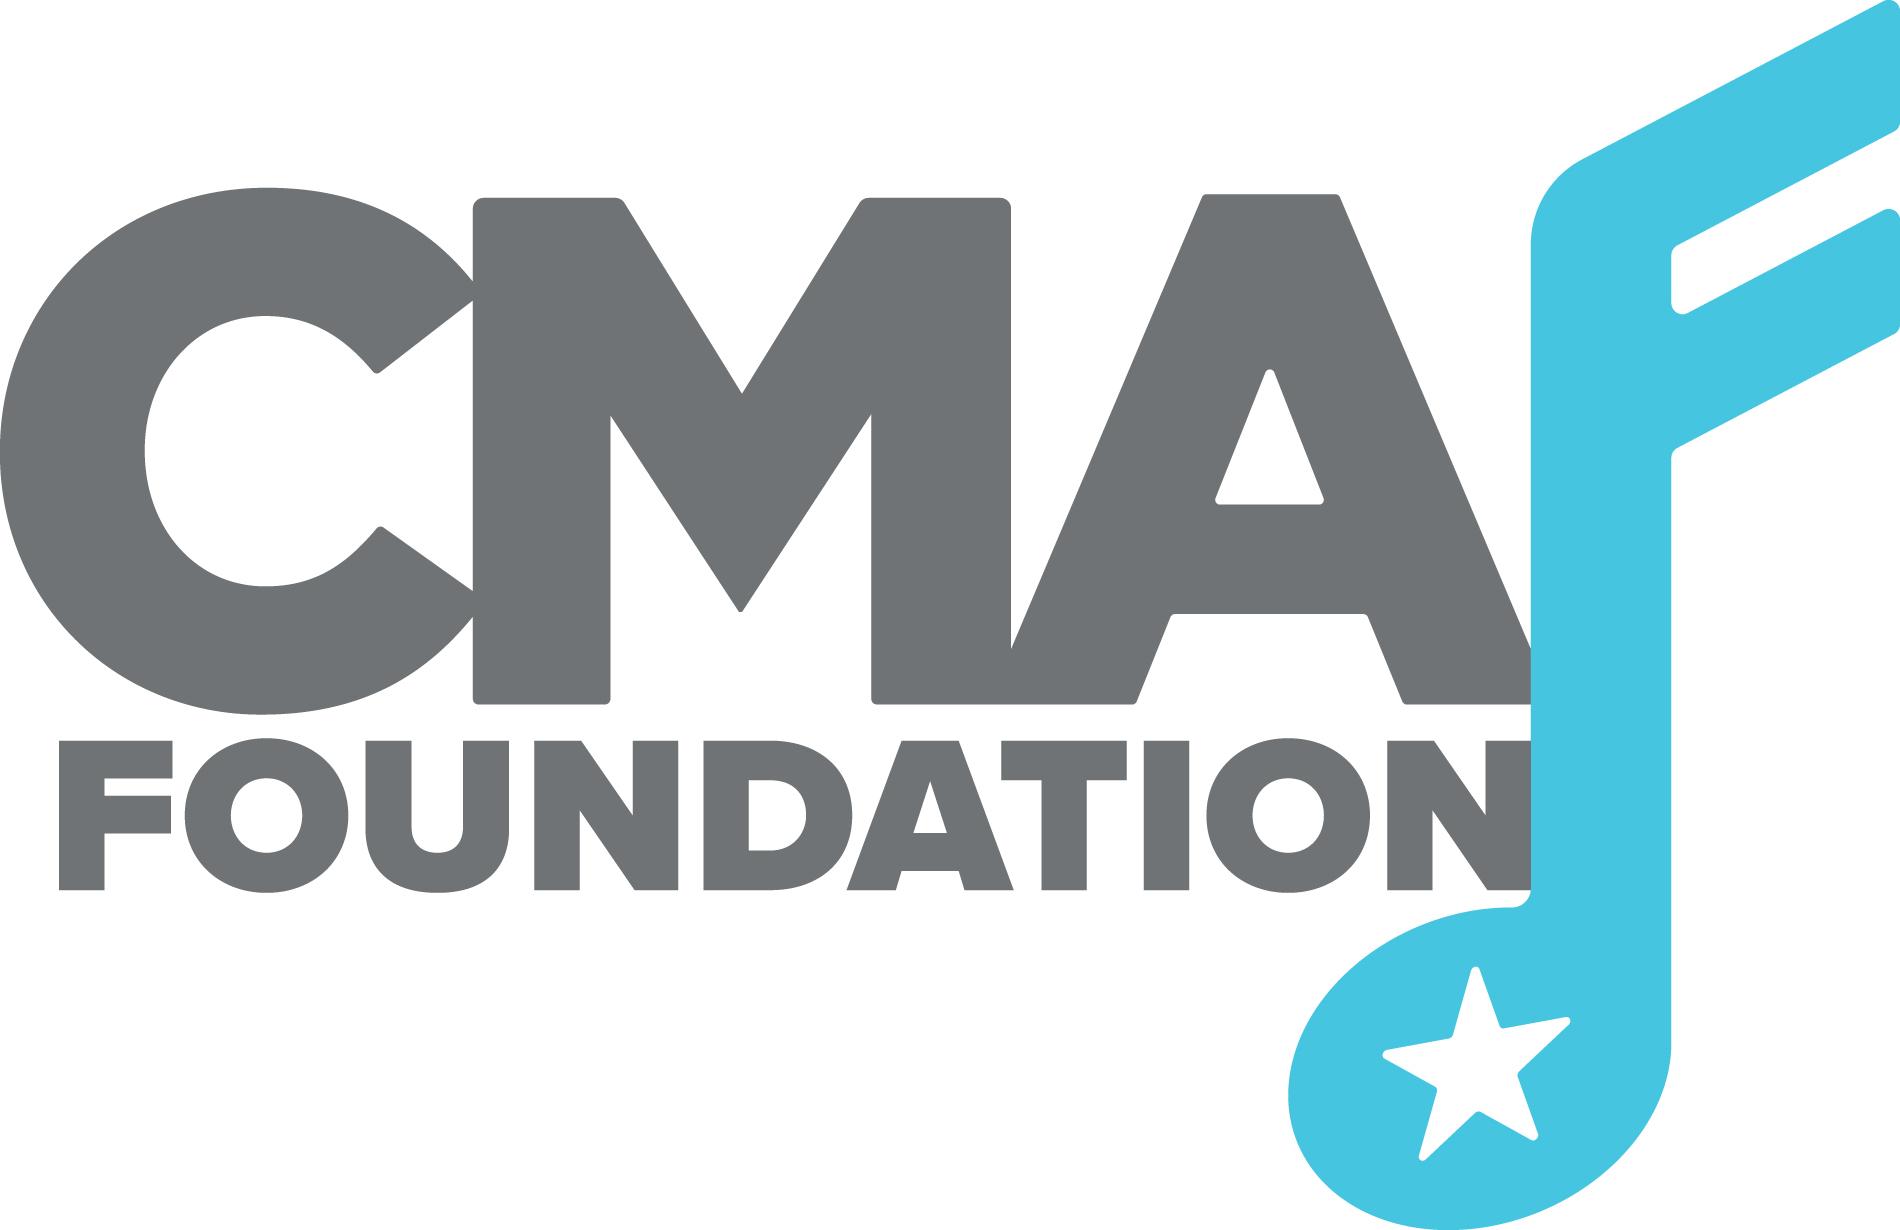 CMA_Foundation_Logo_NoTag_4C.jpg